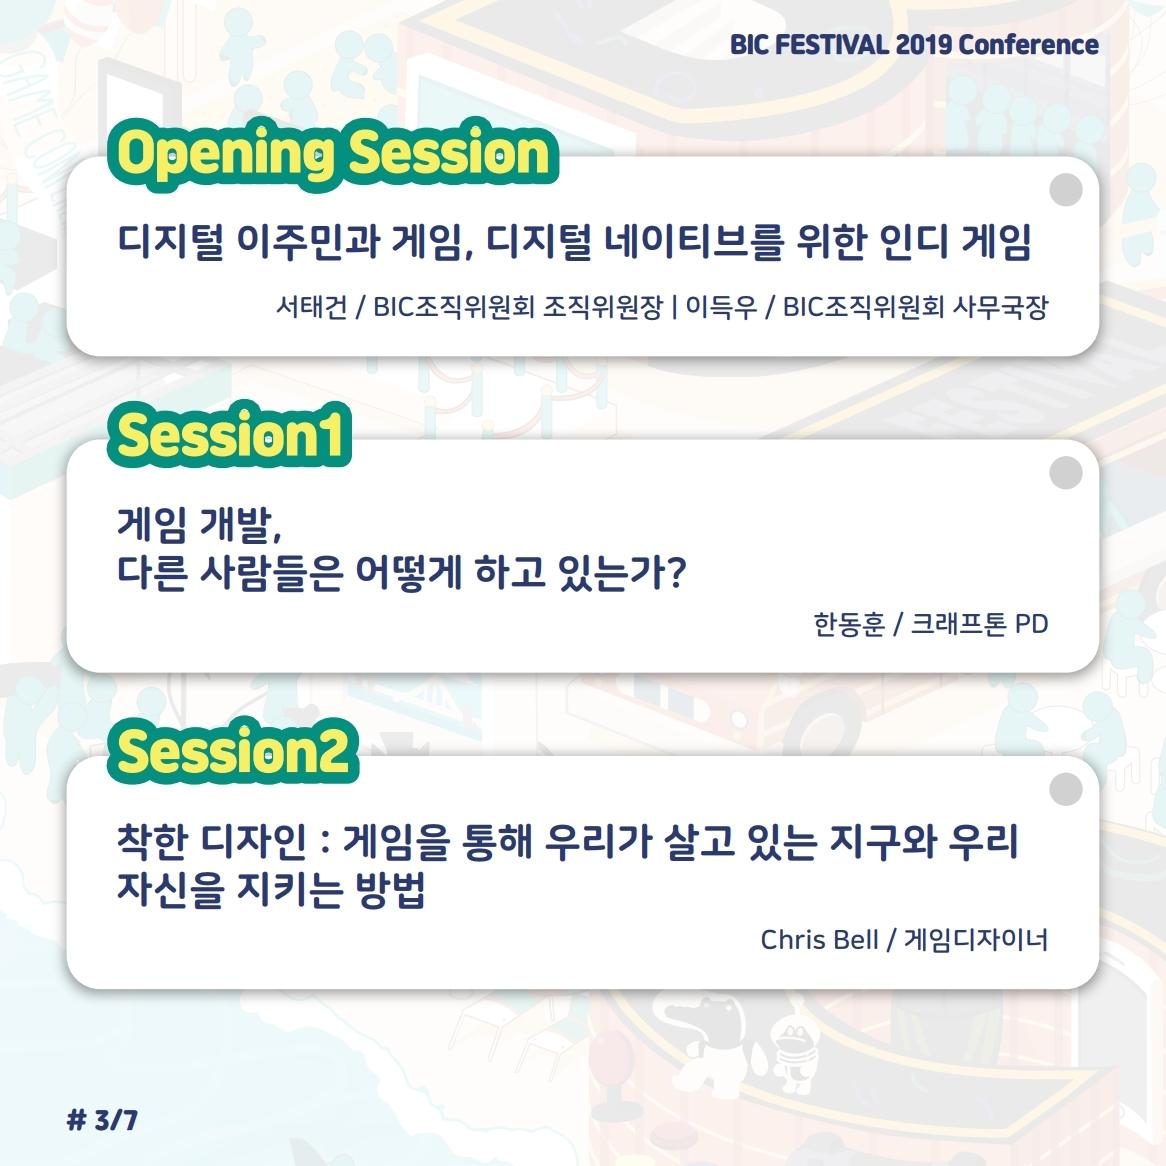 BIC_cardnews_01_Conference_03.jpg